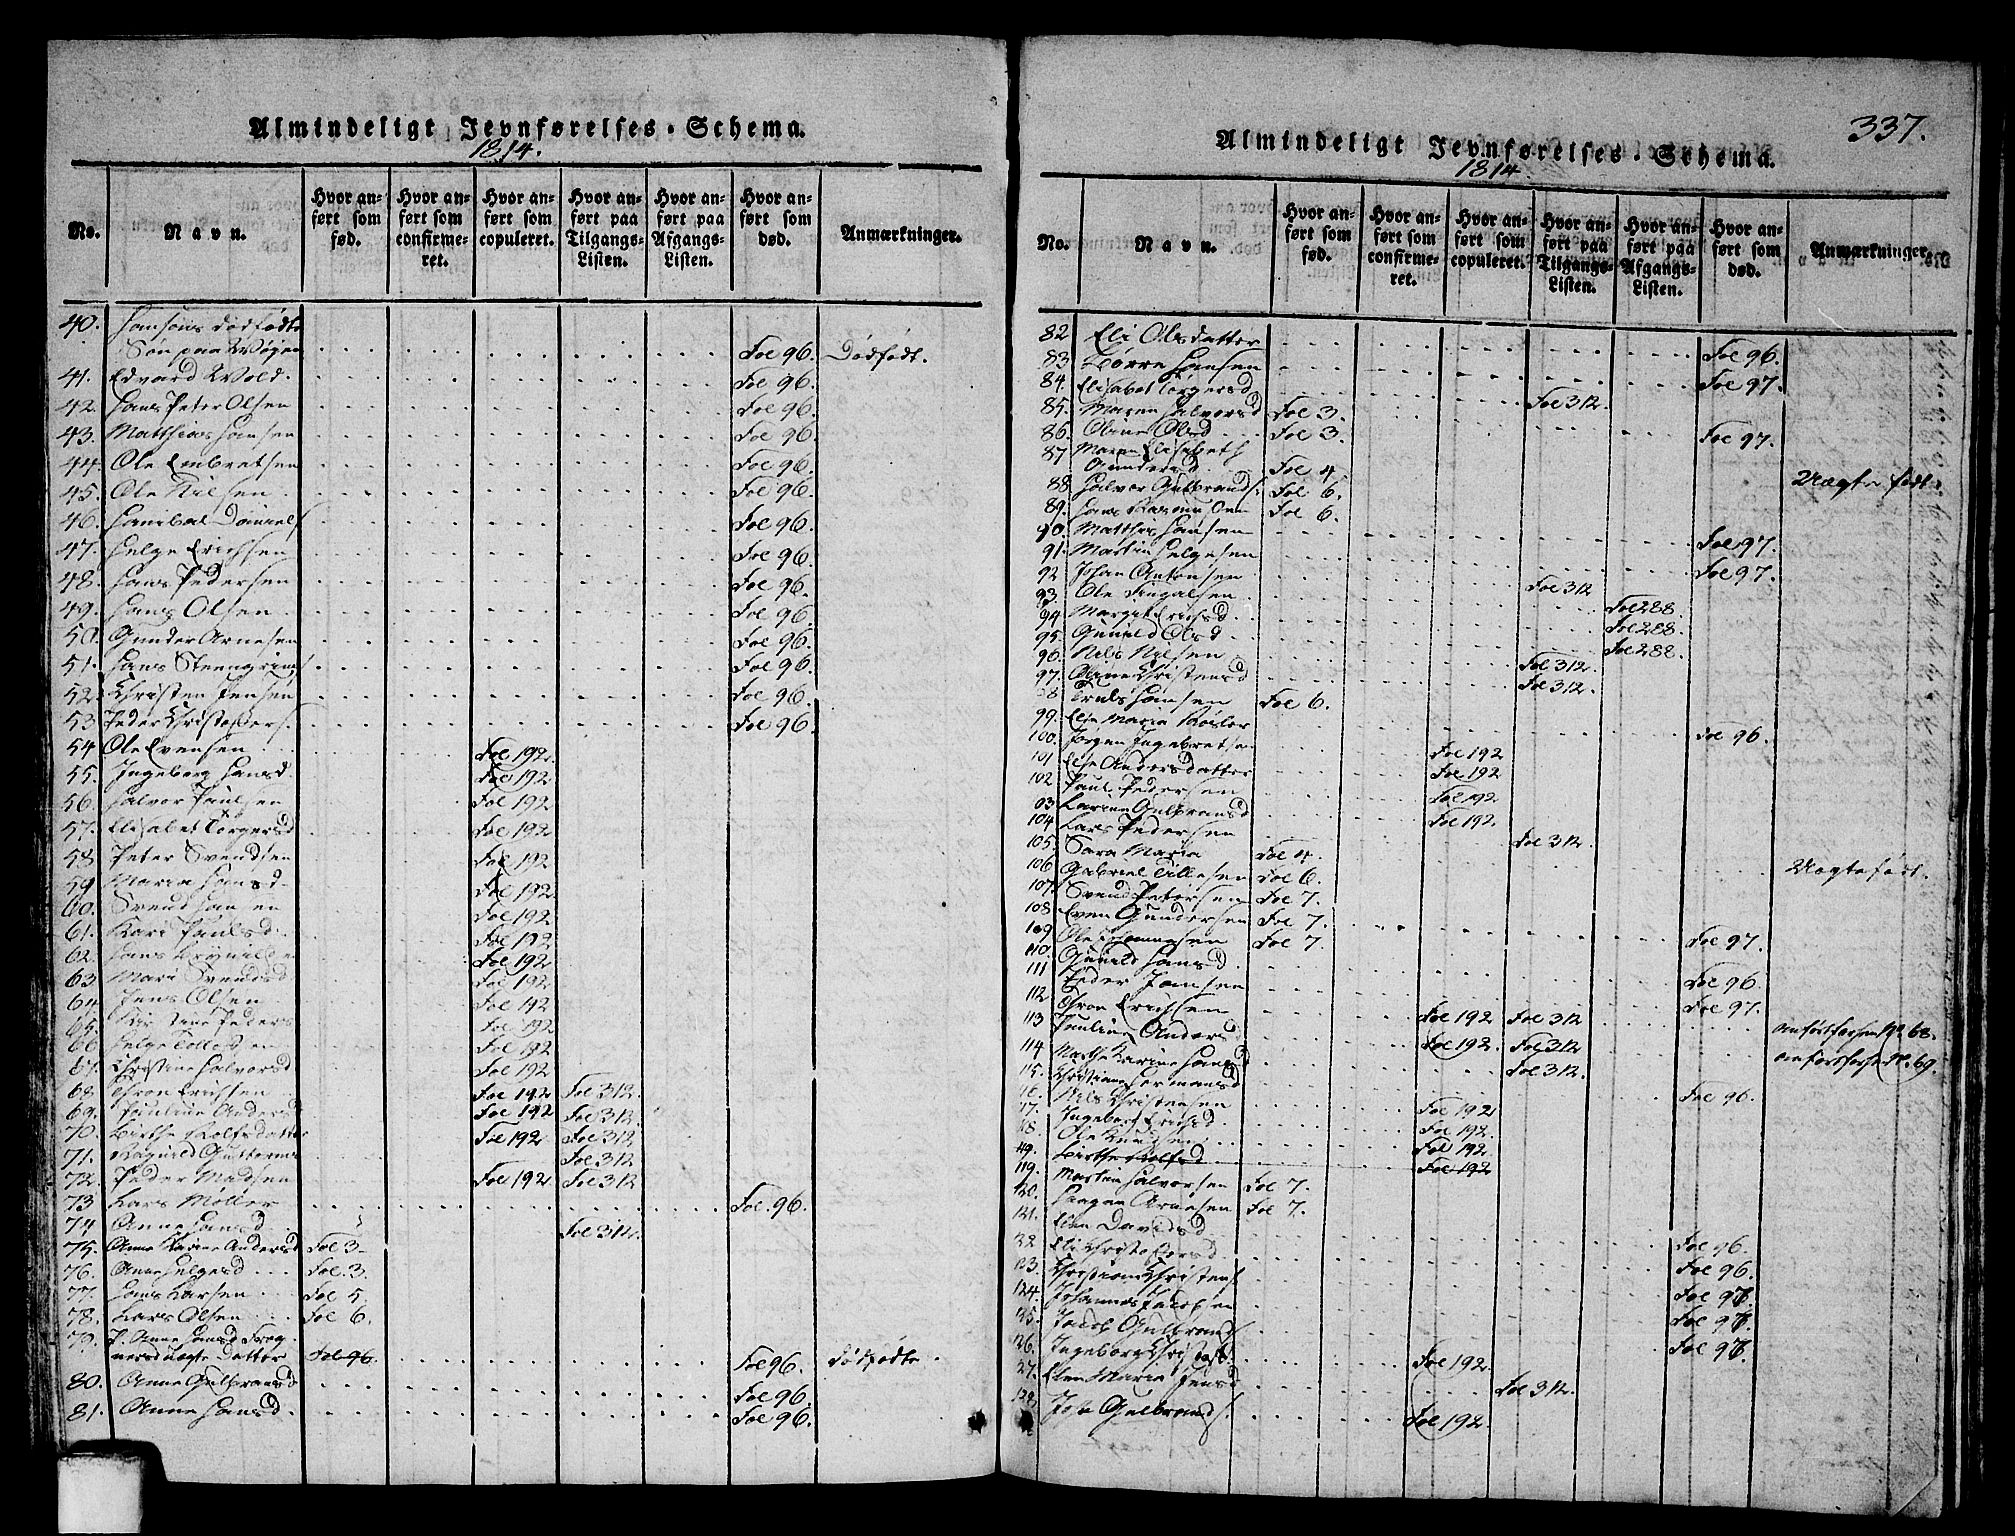 SAO, Asker prestekontor Kirkebøker, G/Ga/L0001: Parish register (copy) no. I 1, 1814-1830, p. 337